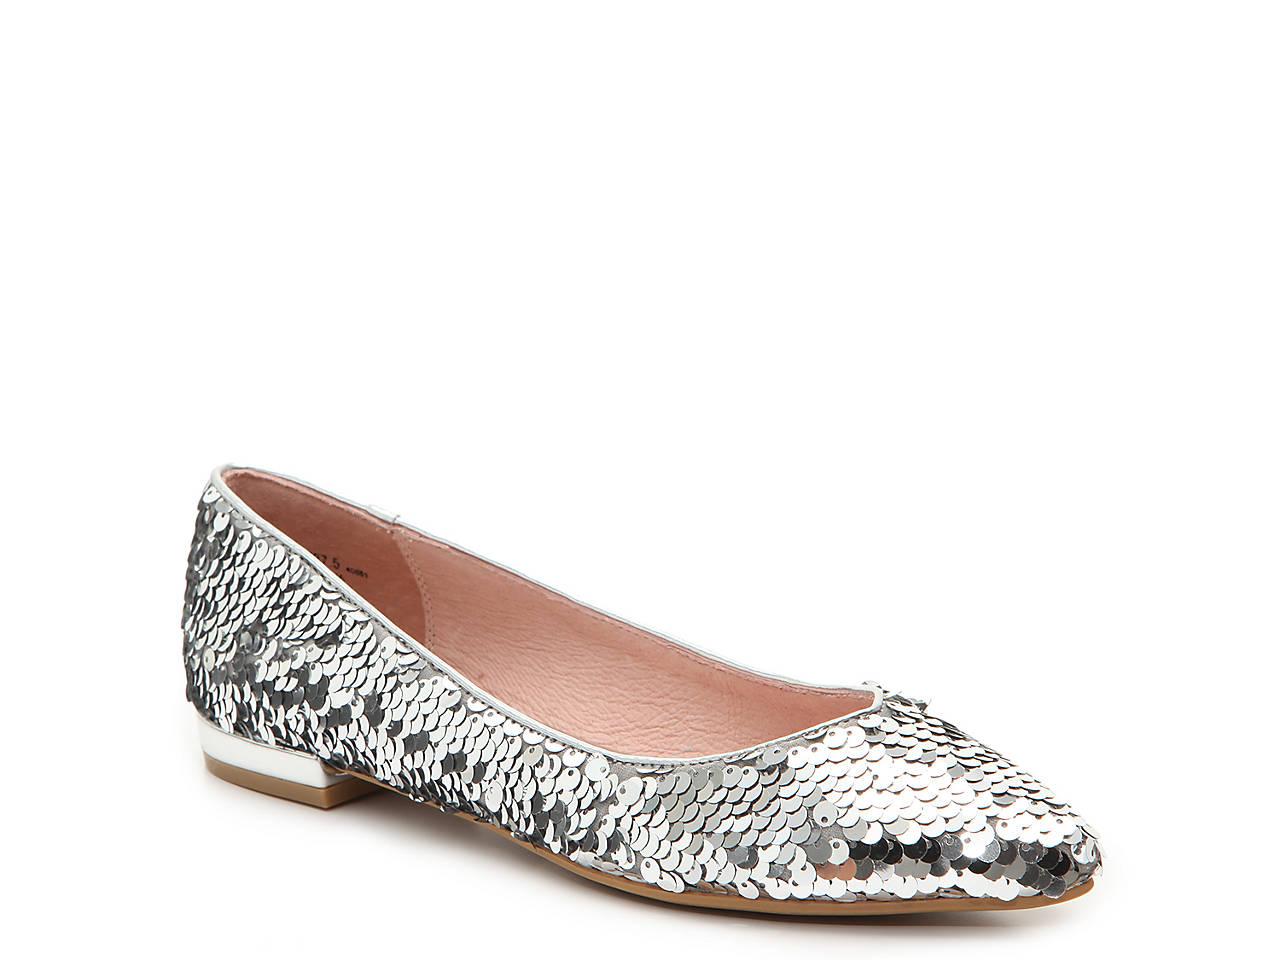 857187e20 Chinese Laundry Graceful Flat Women's Shoes   DSW